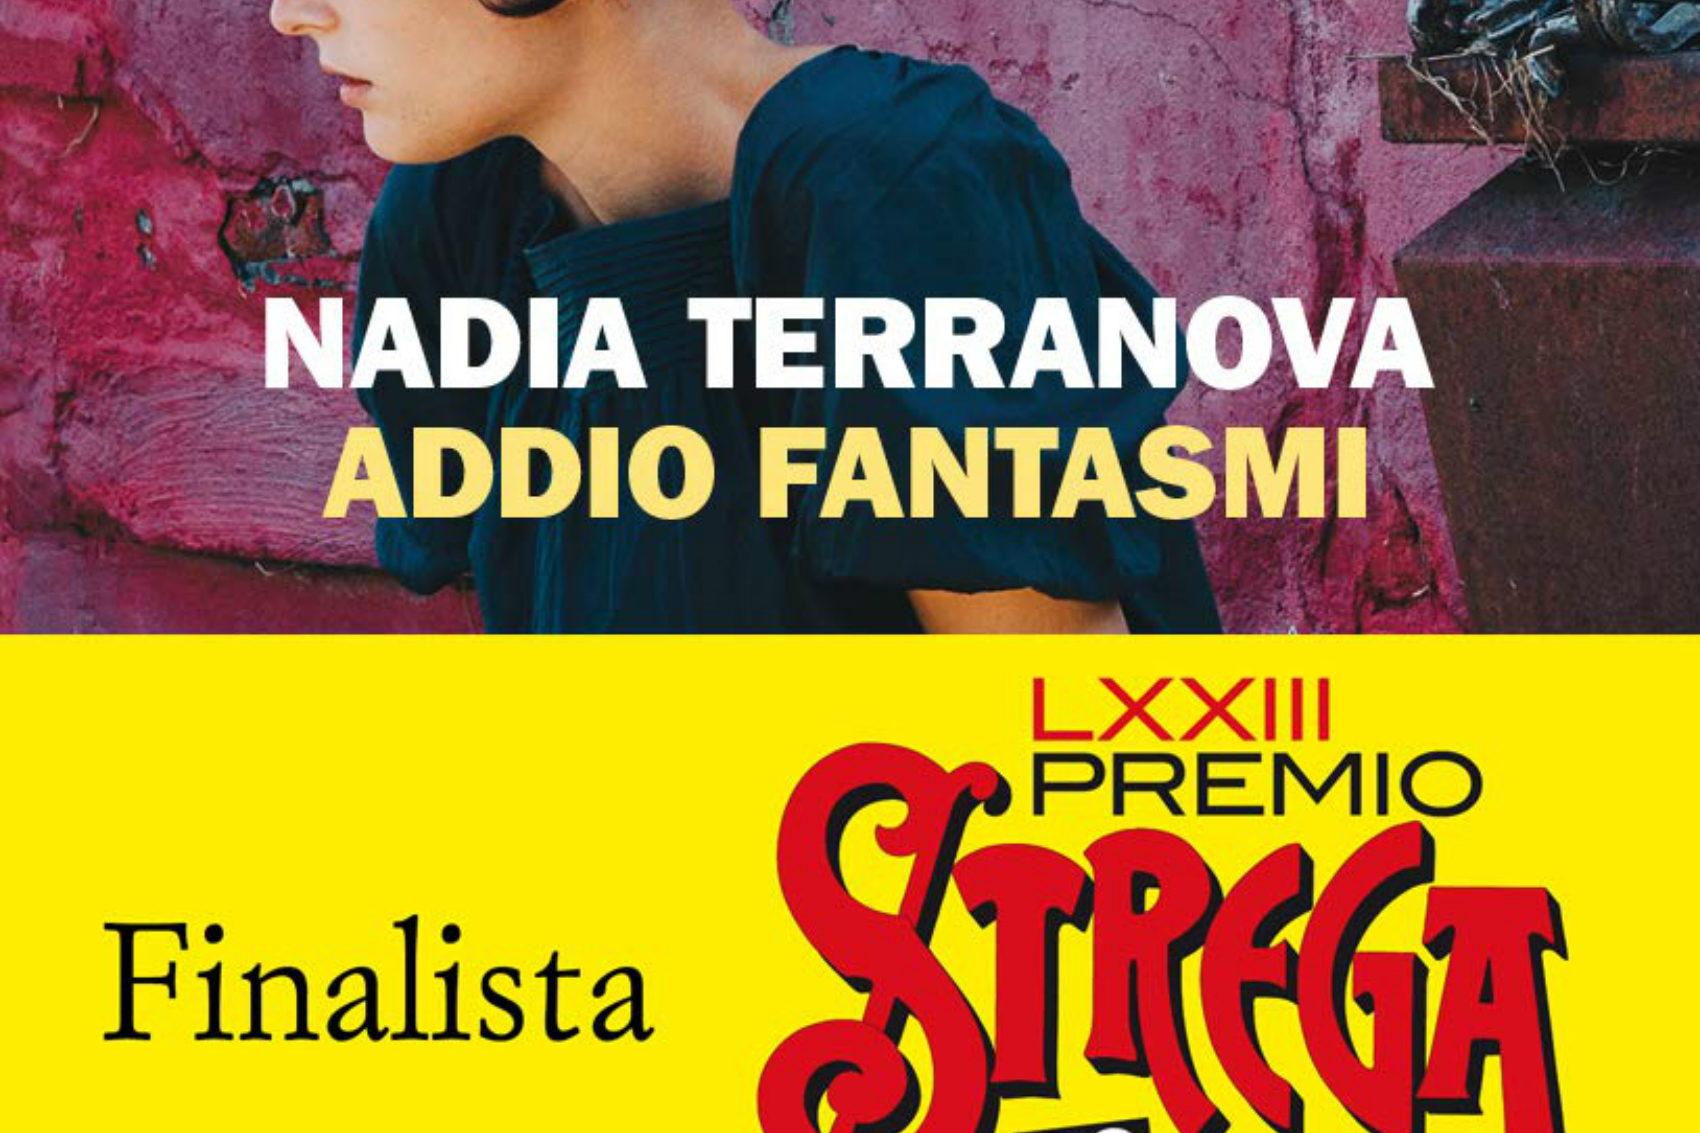 Nadia Terranova; Addio Fantasmi